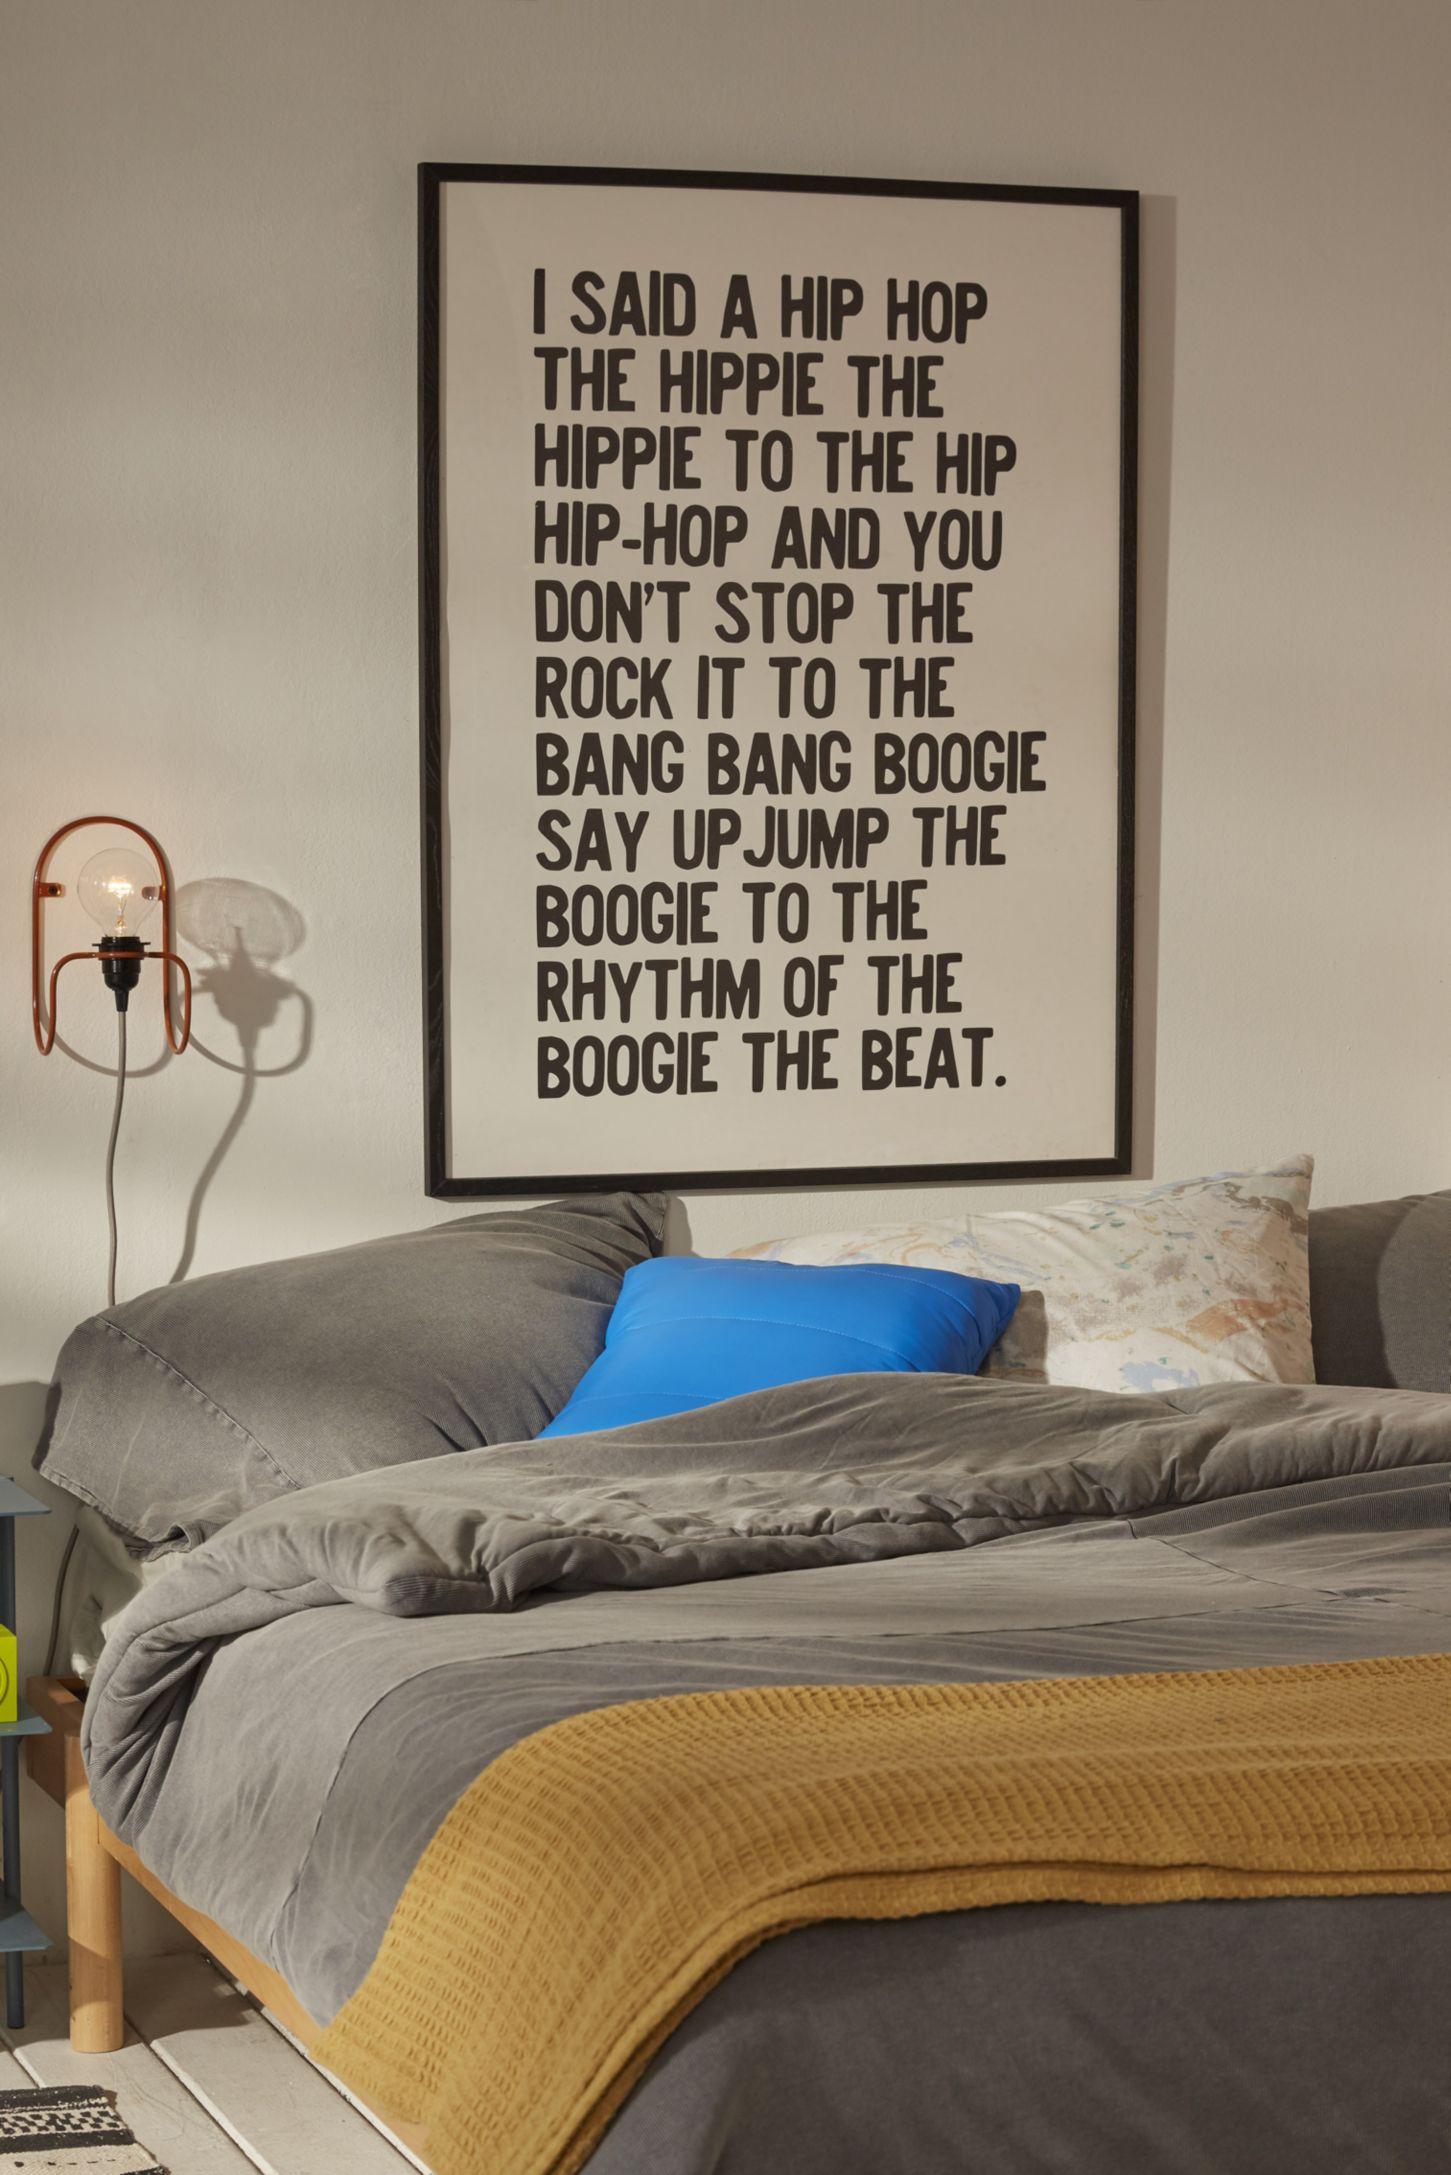 Honeymoon Hotel Rapper s Delight Art Print. Apartment  Art   Room D cor   Urban Outfitters